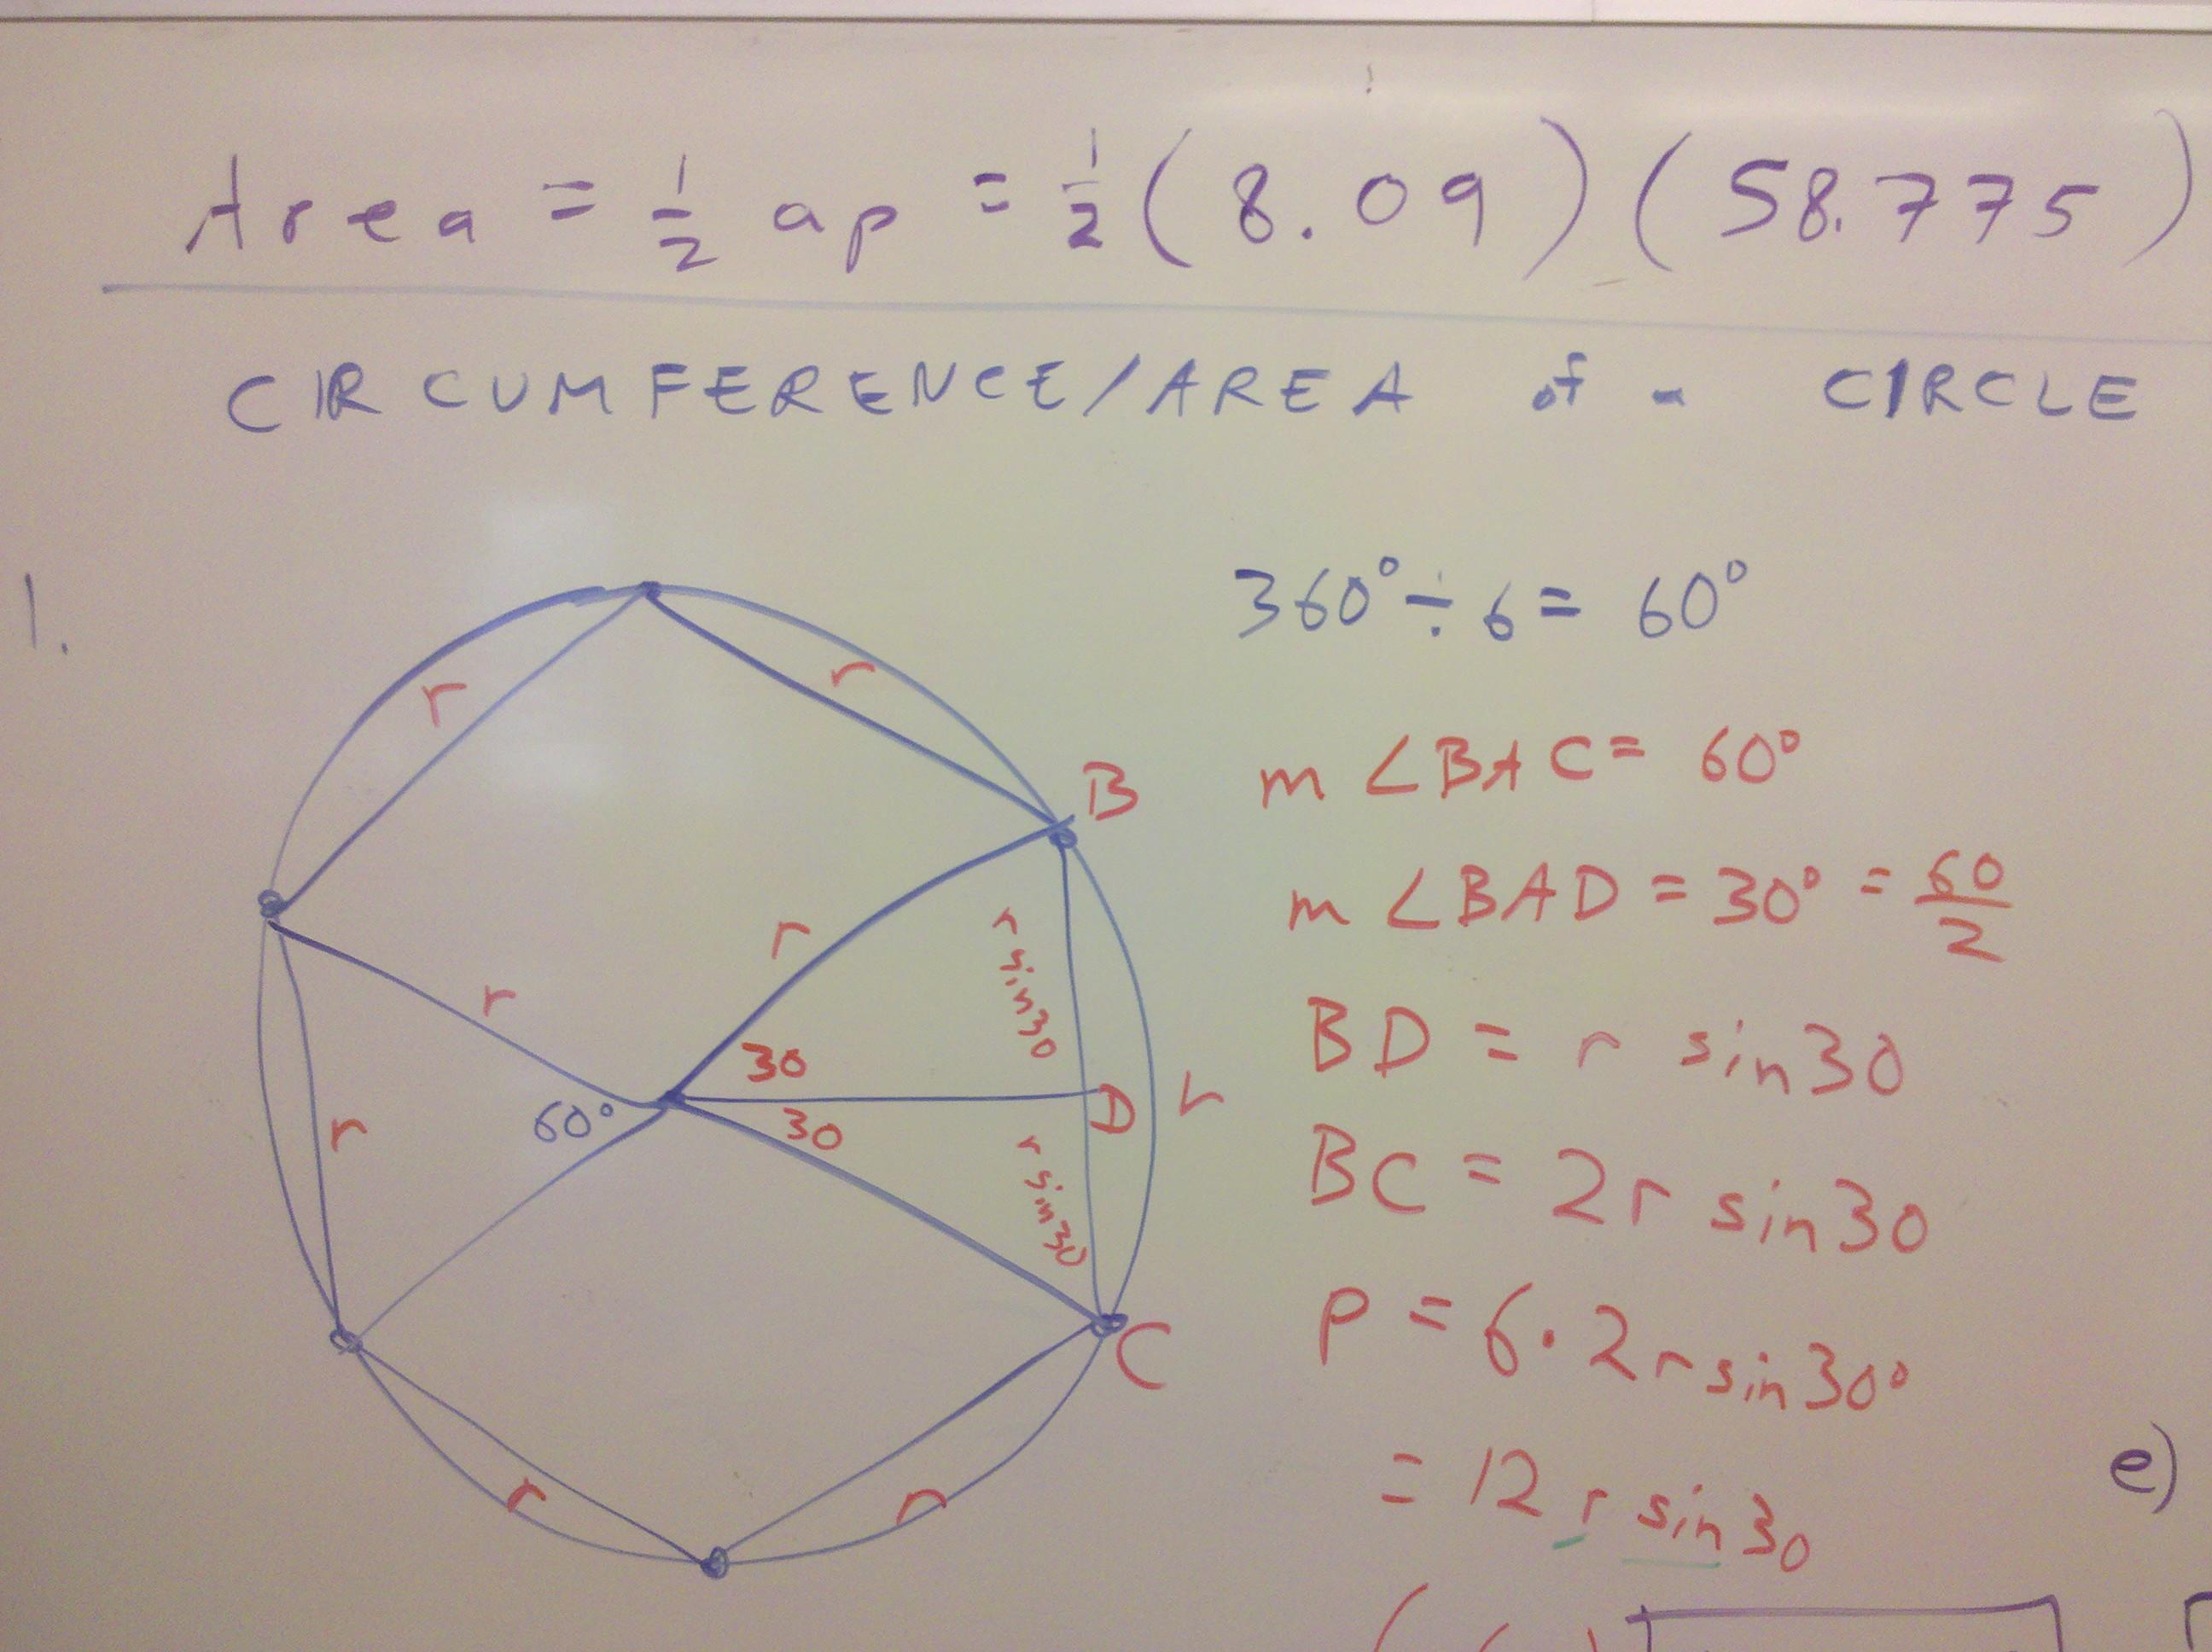 Gebhard Curt Geometrynotes